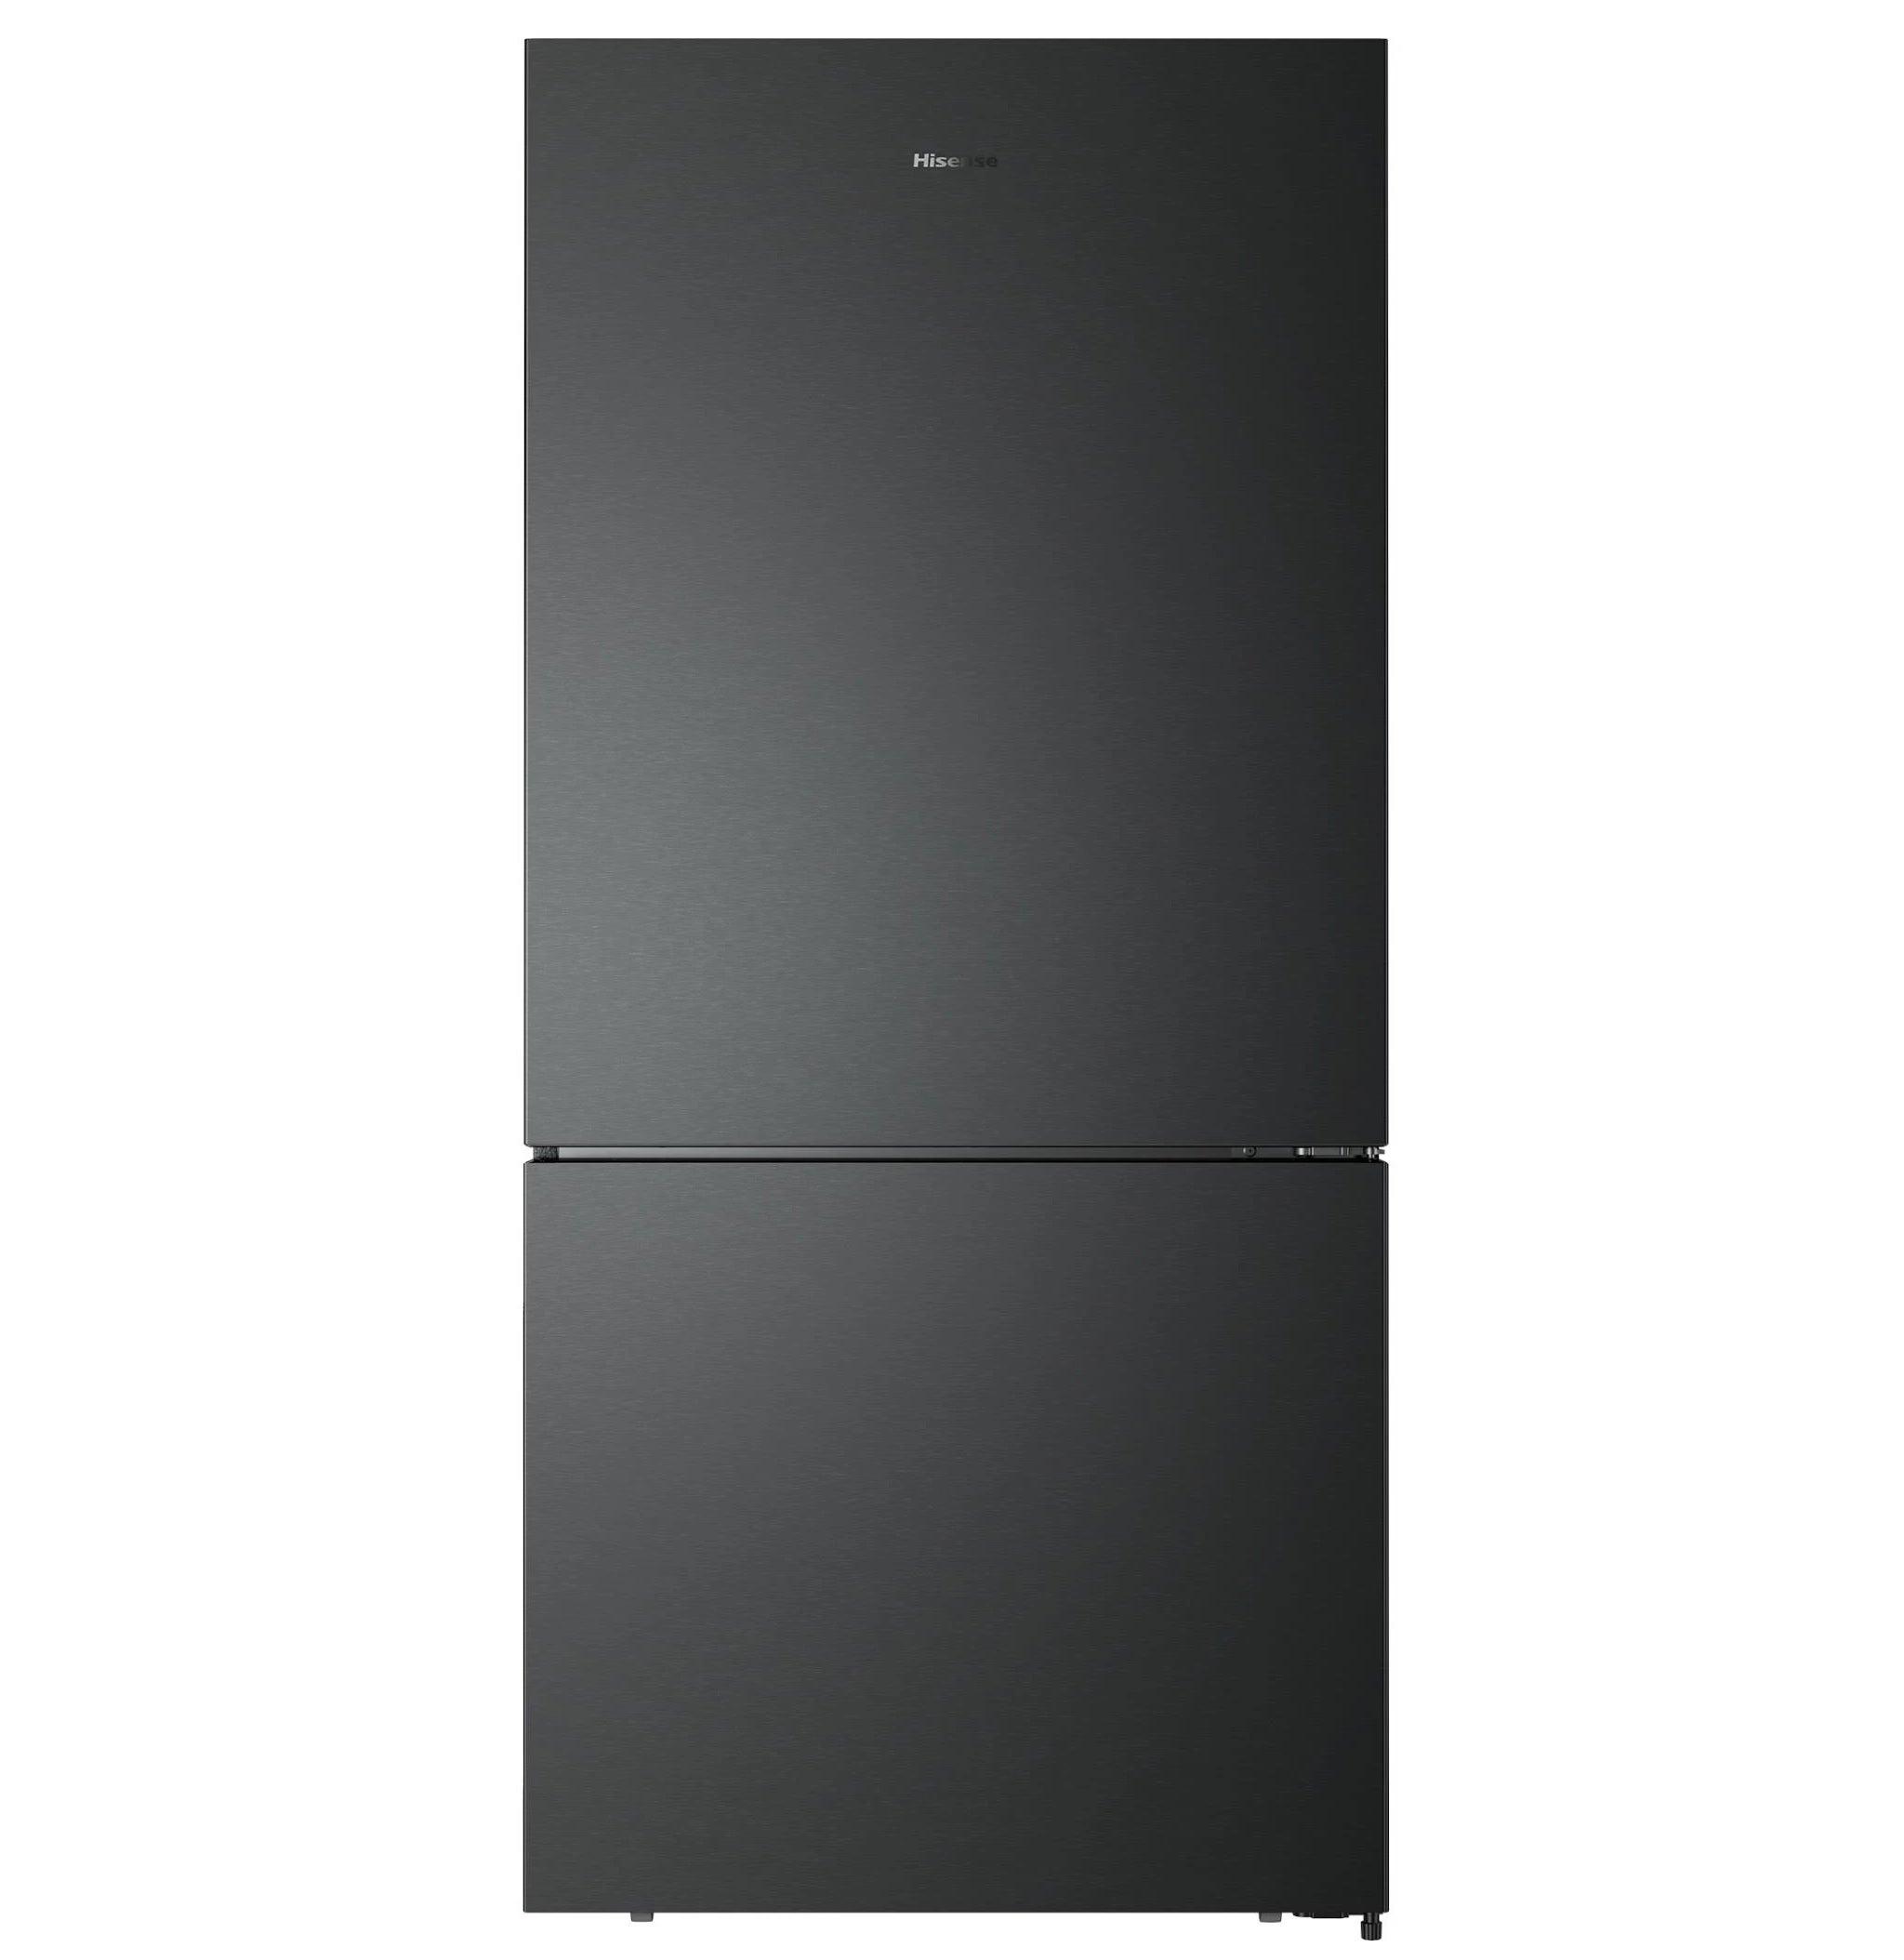 Hisense HR6BMFF519 Refrigerator